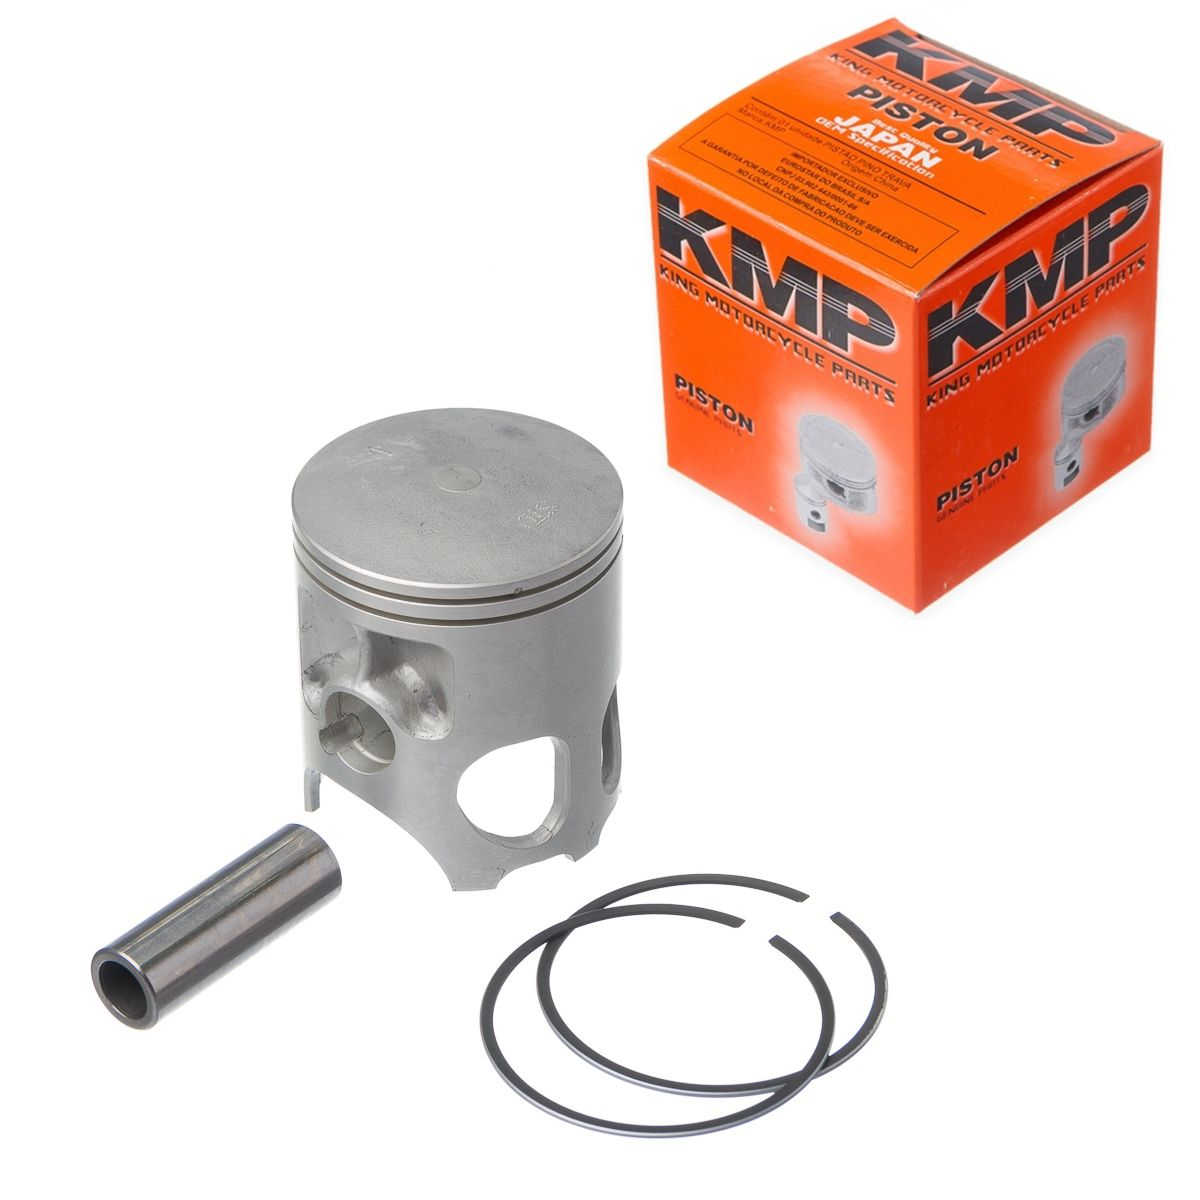 Pistão Kit C/ Anel Kmp Rd Rdz 135 Std a 2.00mm